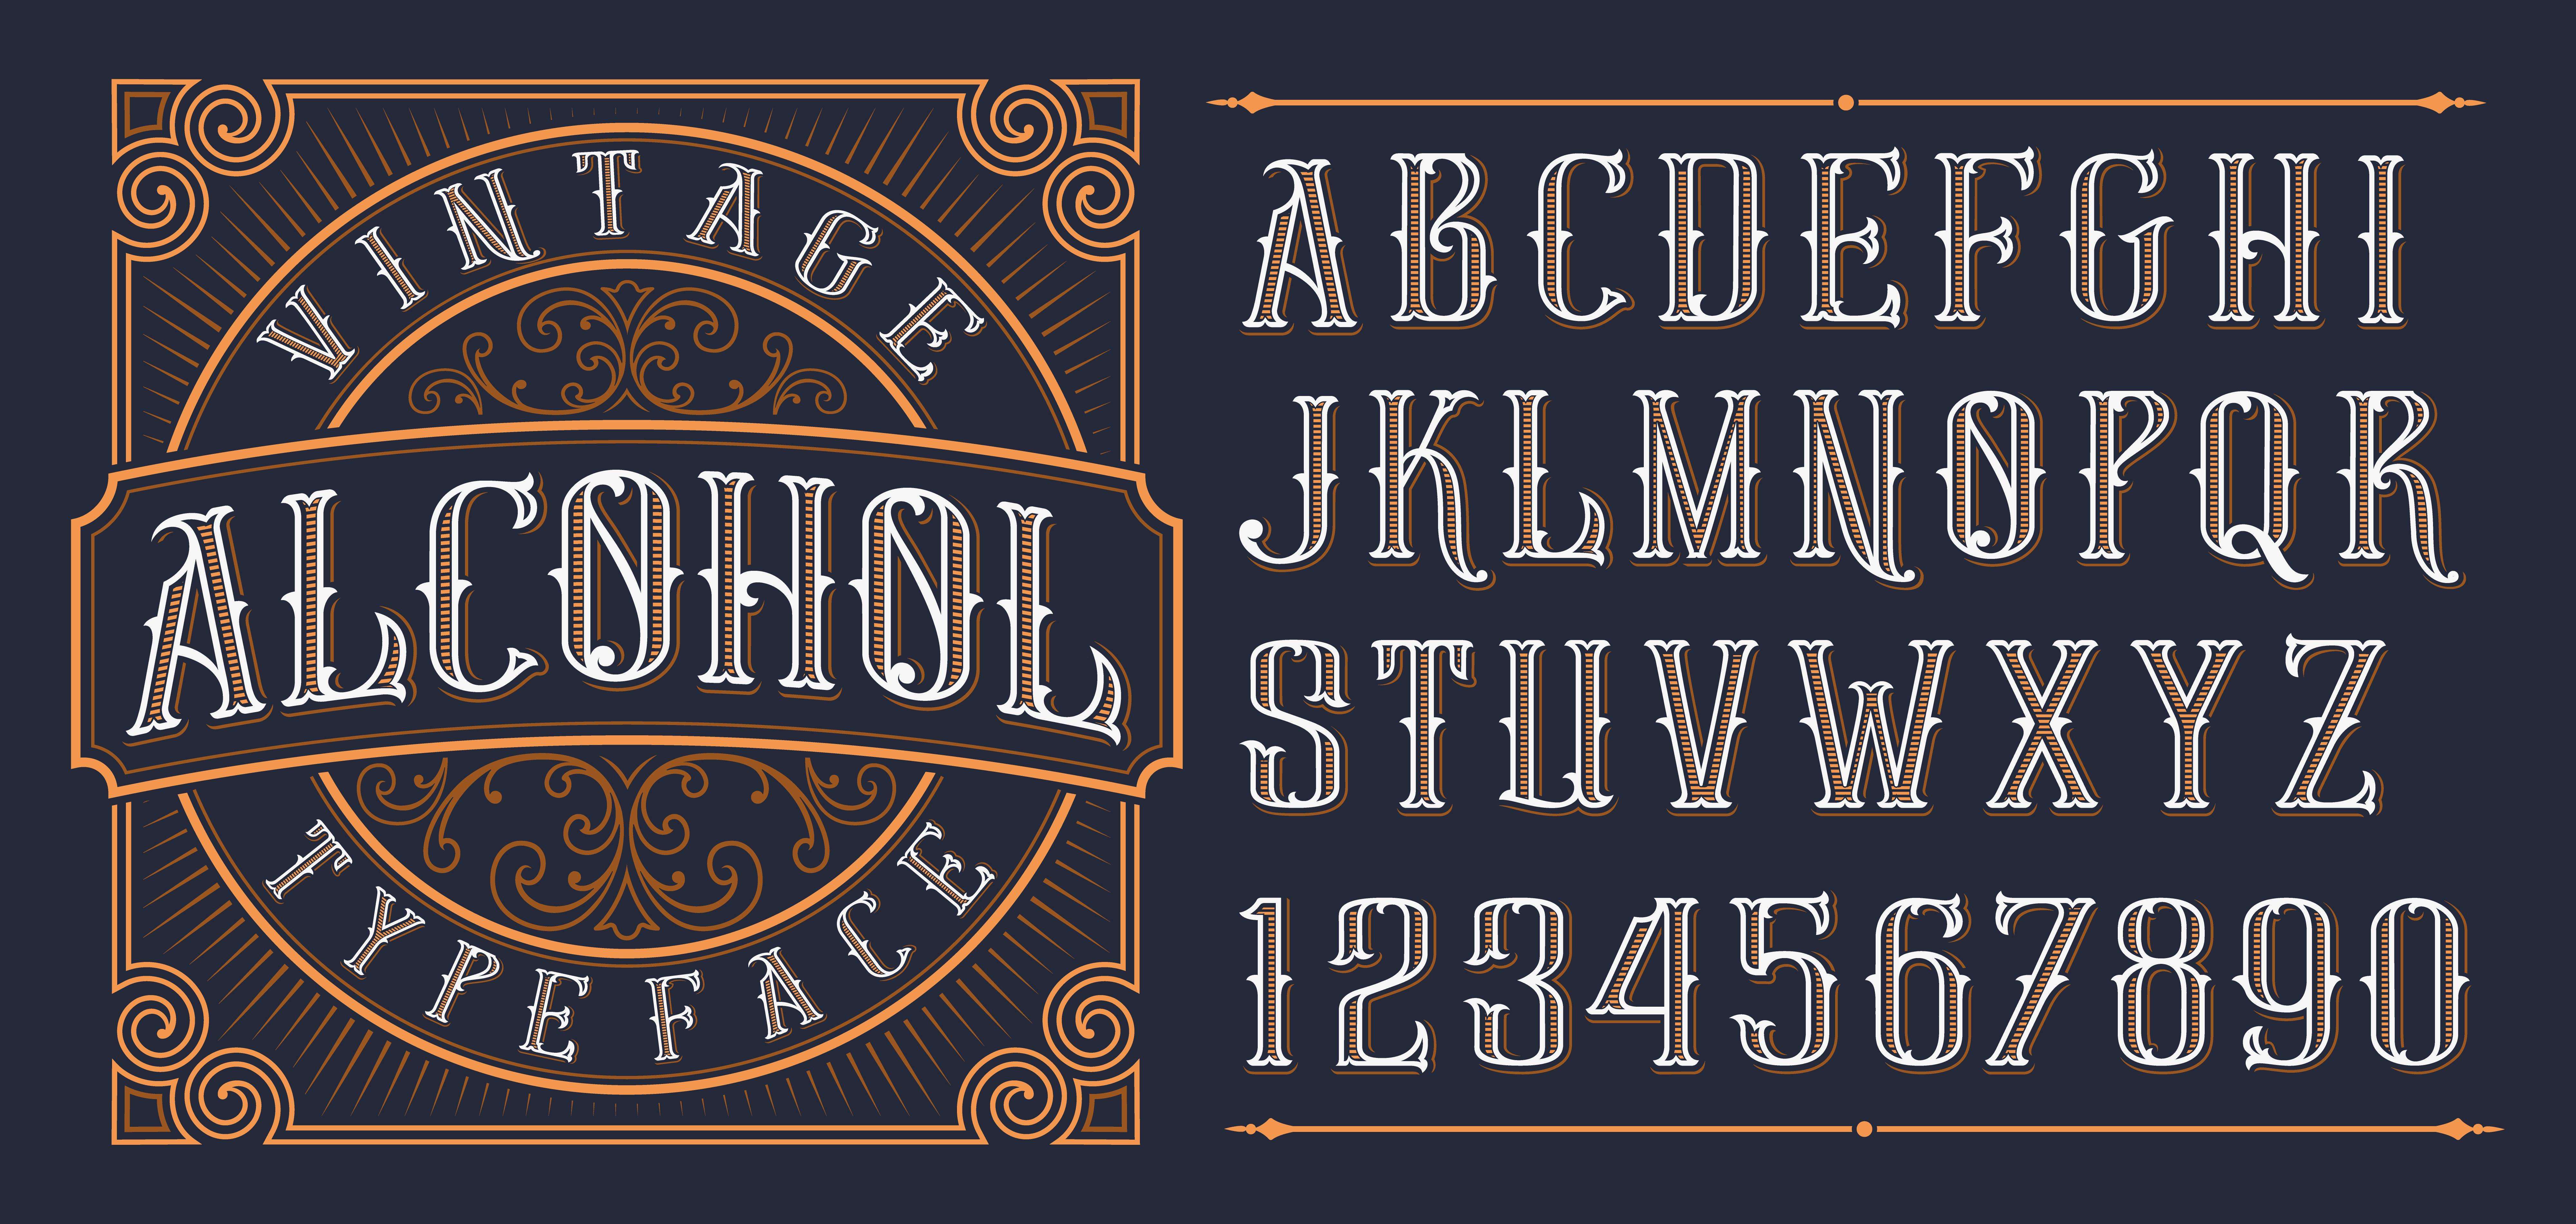 Vintage decorative font. - Download Free Vectors, Clipart ...